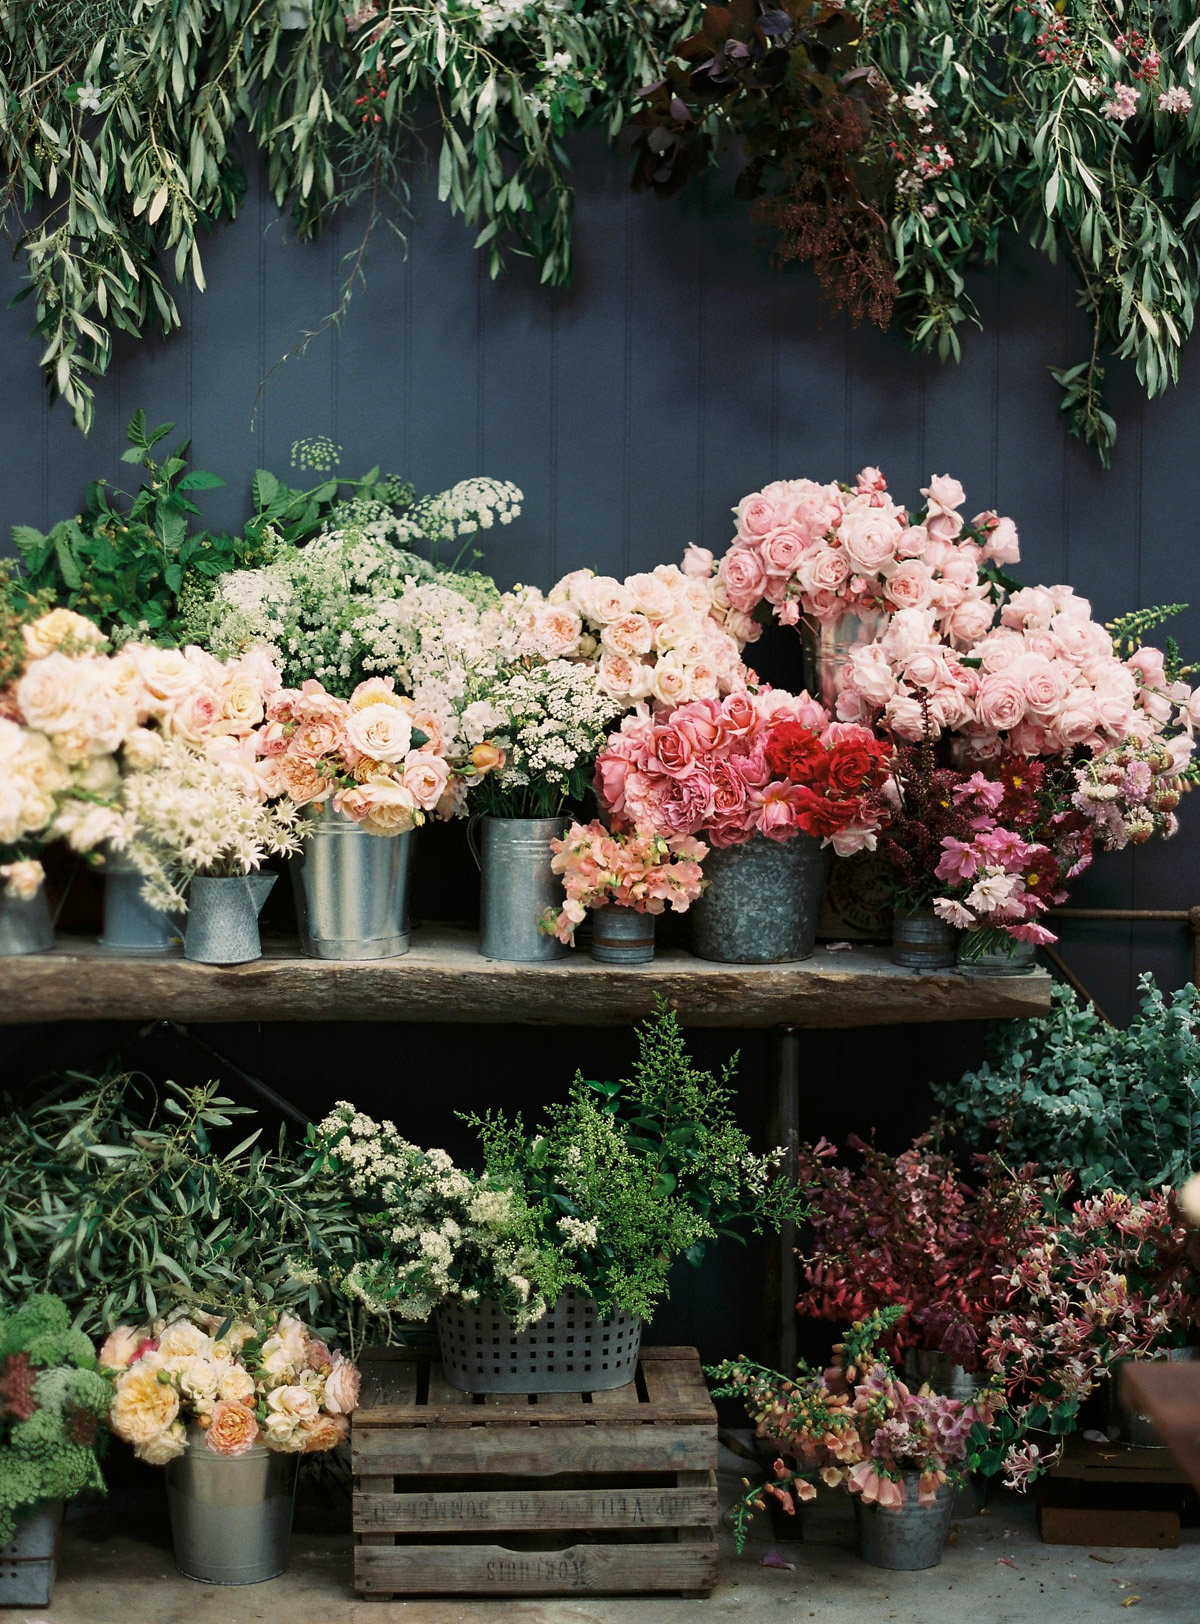 Many buckets of flowers